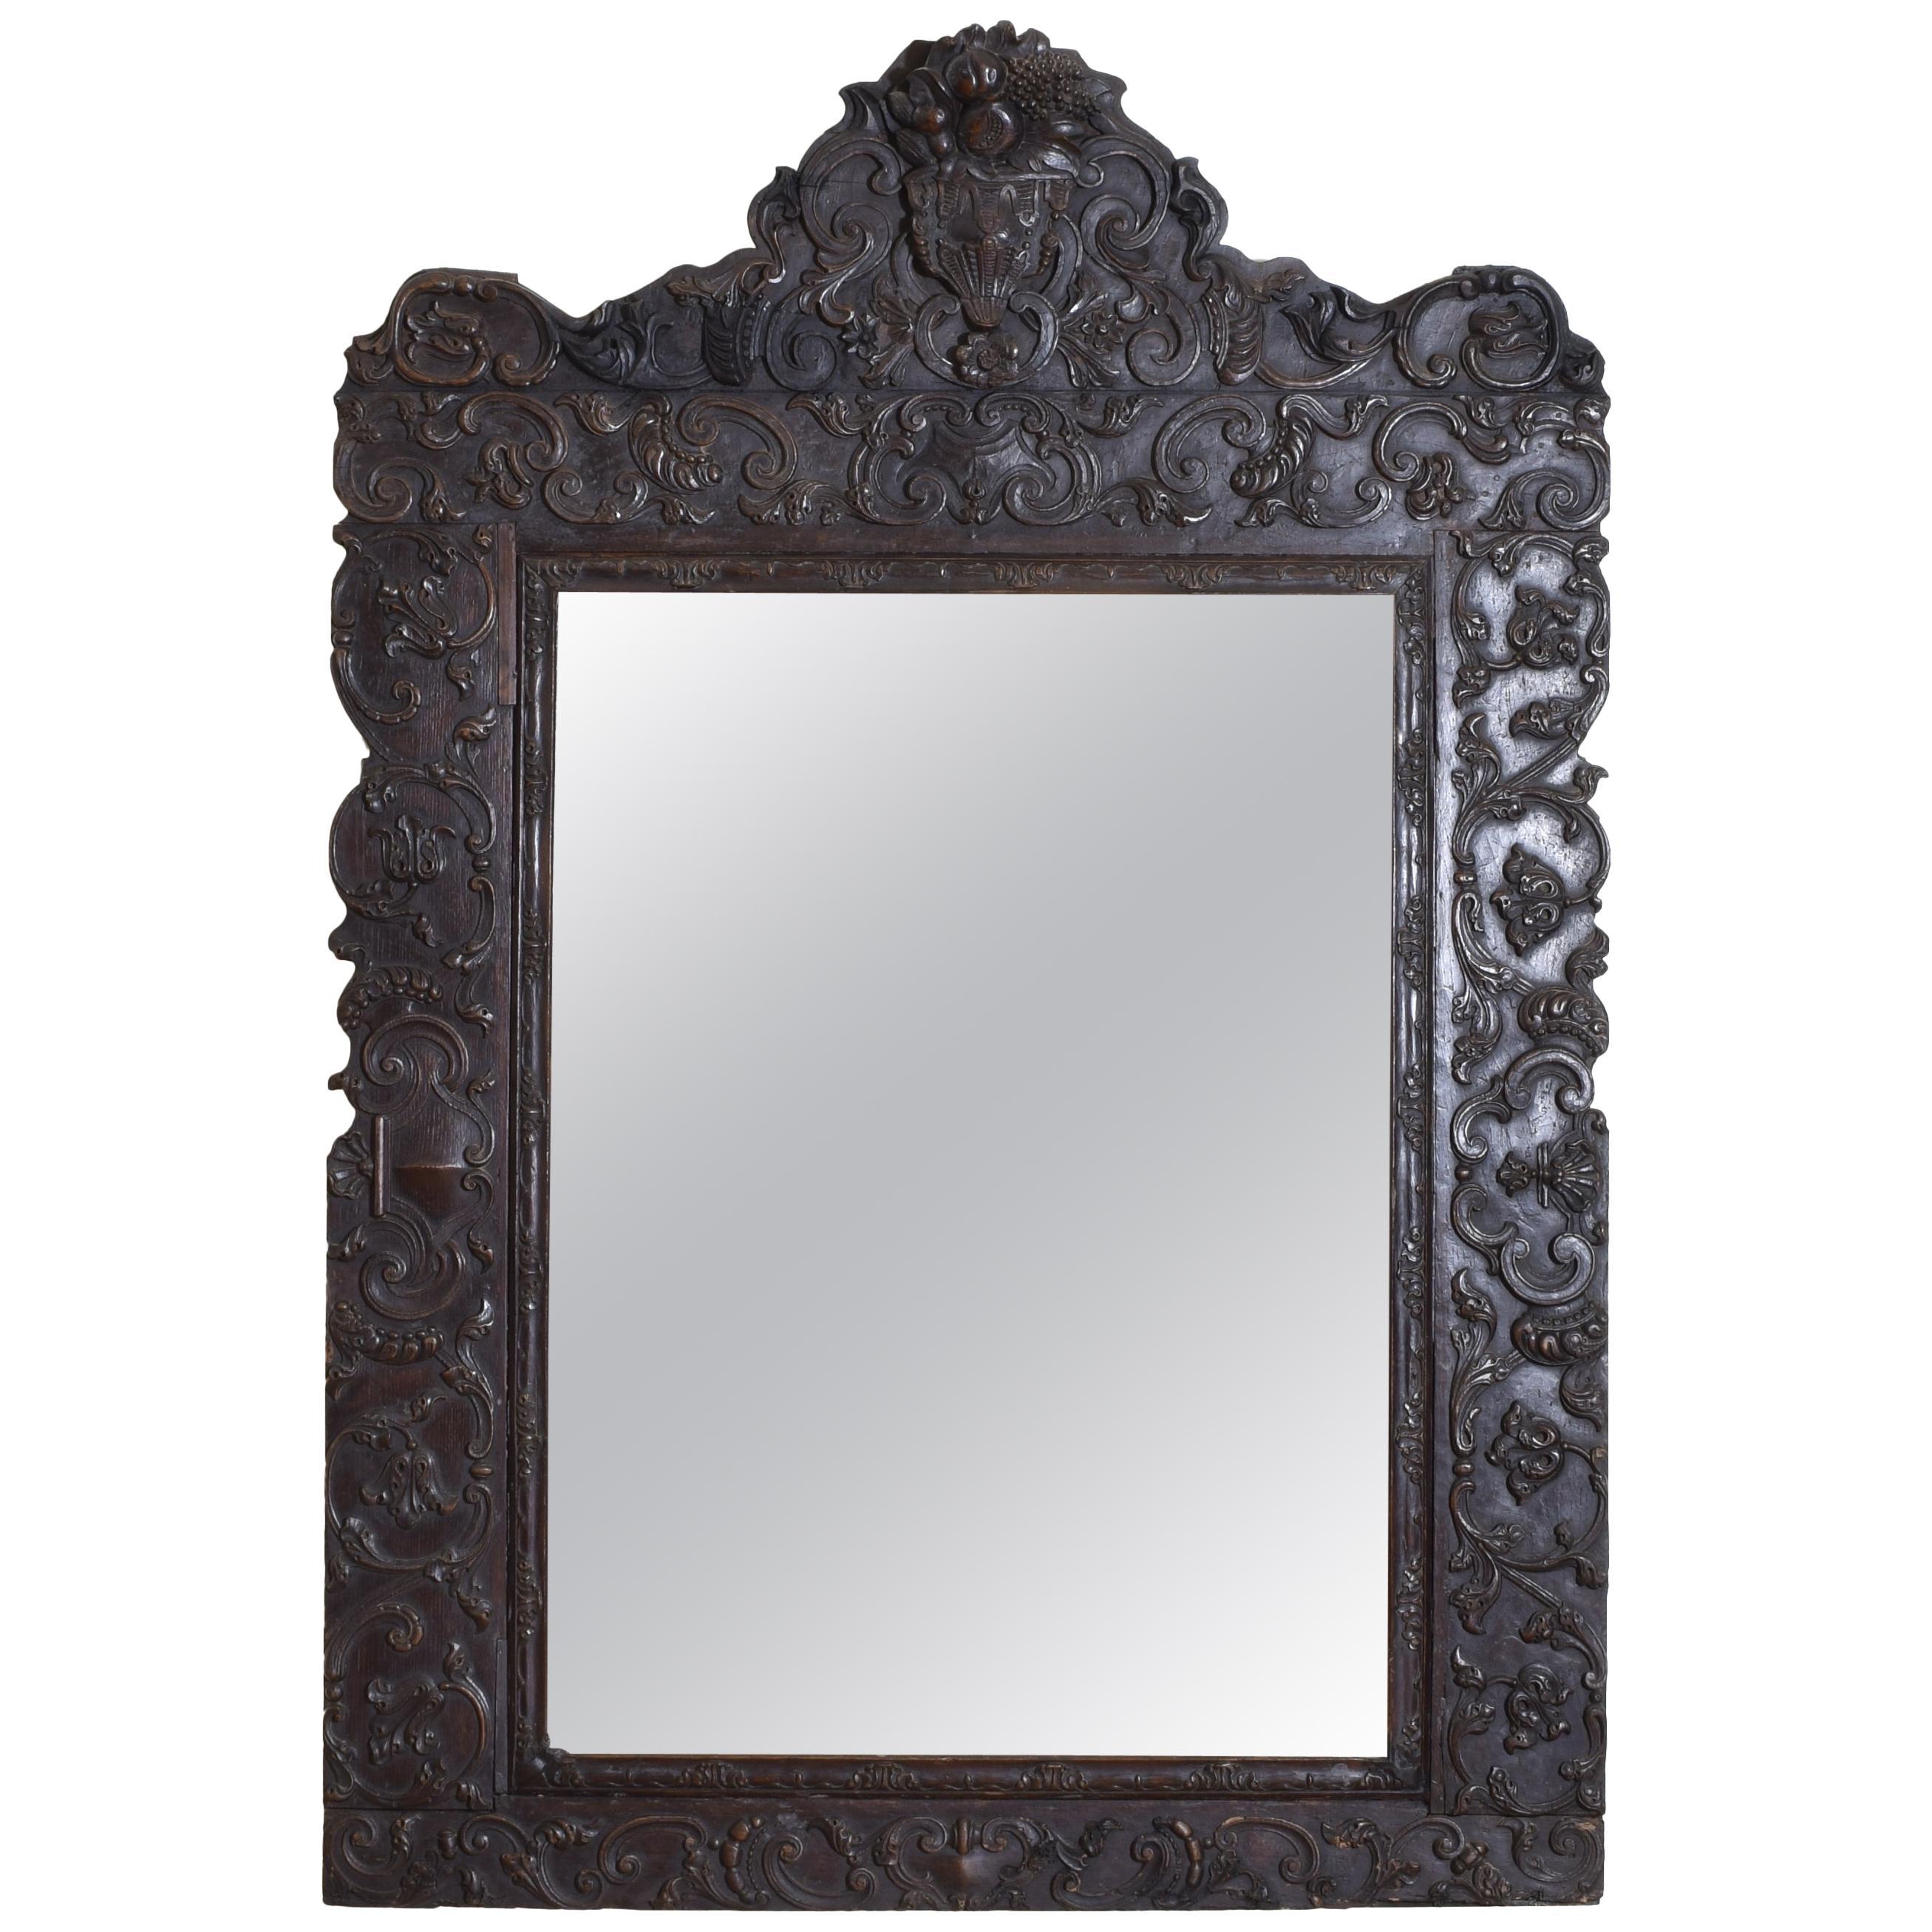 Portuguese Rococo Sizable Carved Walnut Mirror, Mid-18th Century